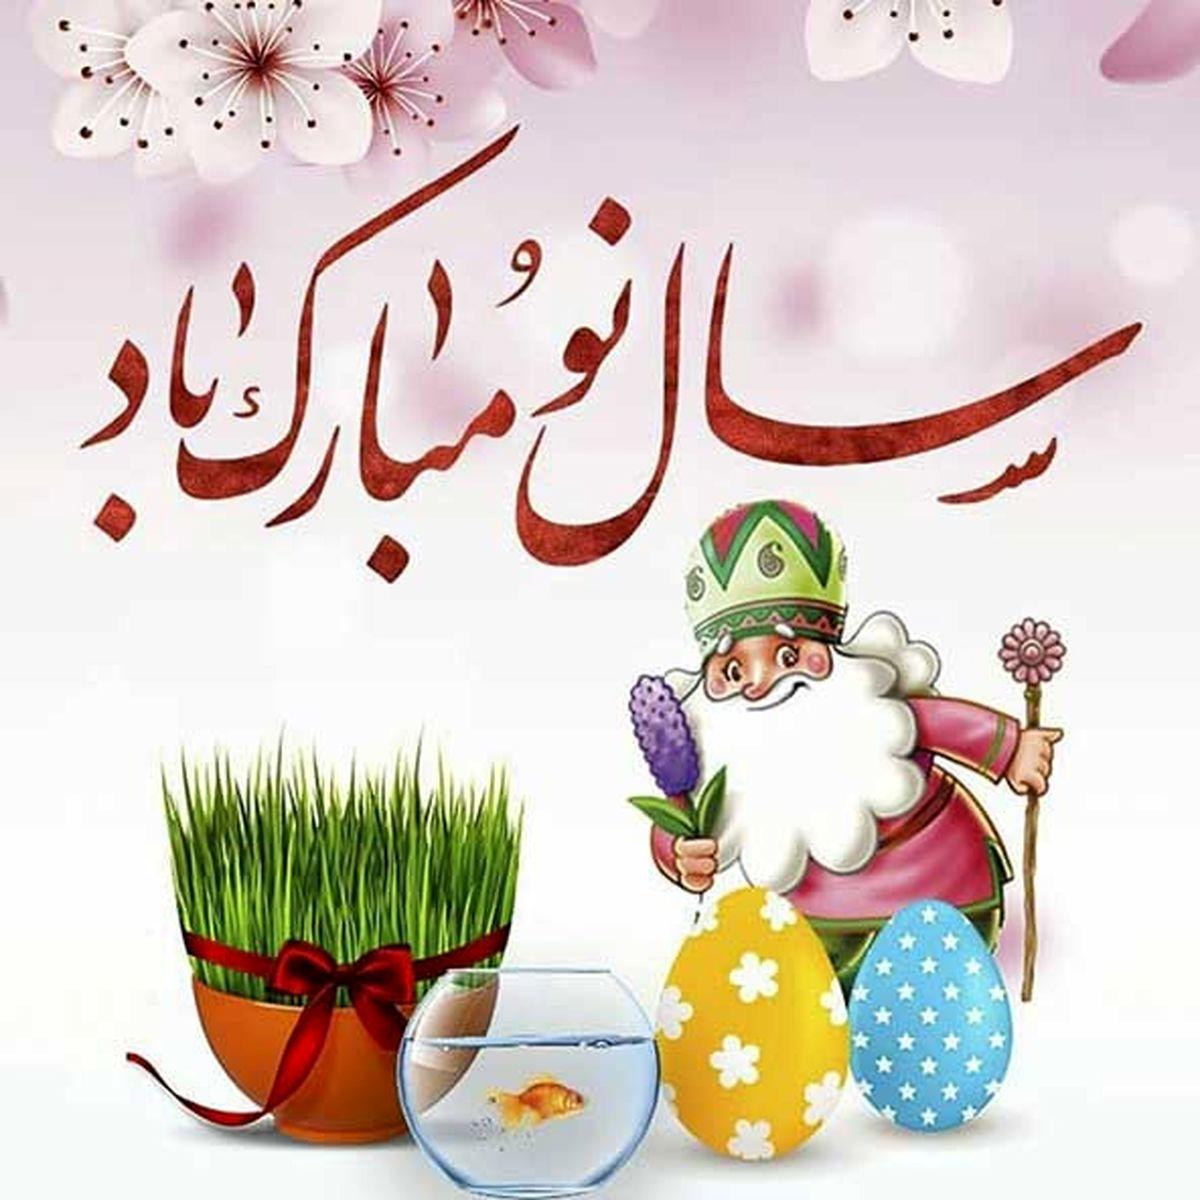 عید نوروز 99 | پیام تبریک سال جدید + تصاویر پروفایل